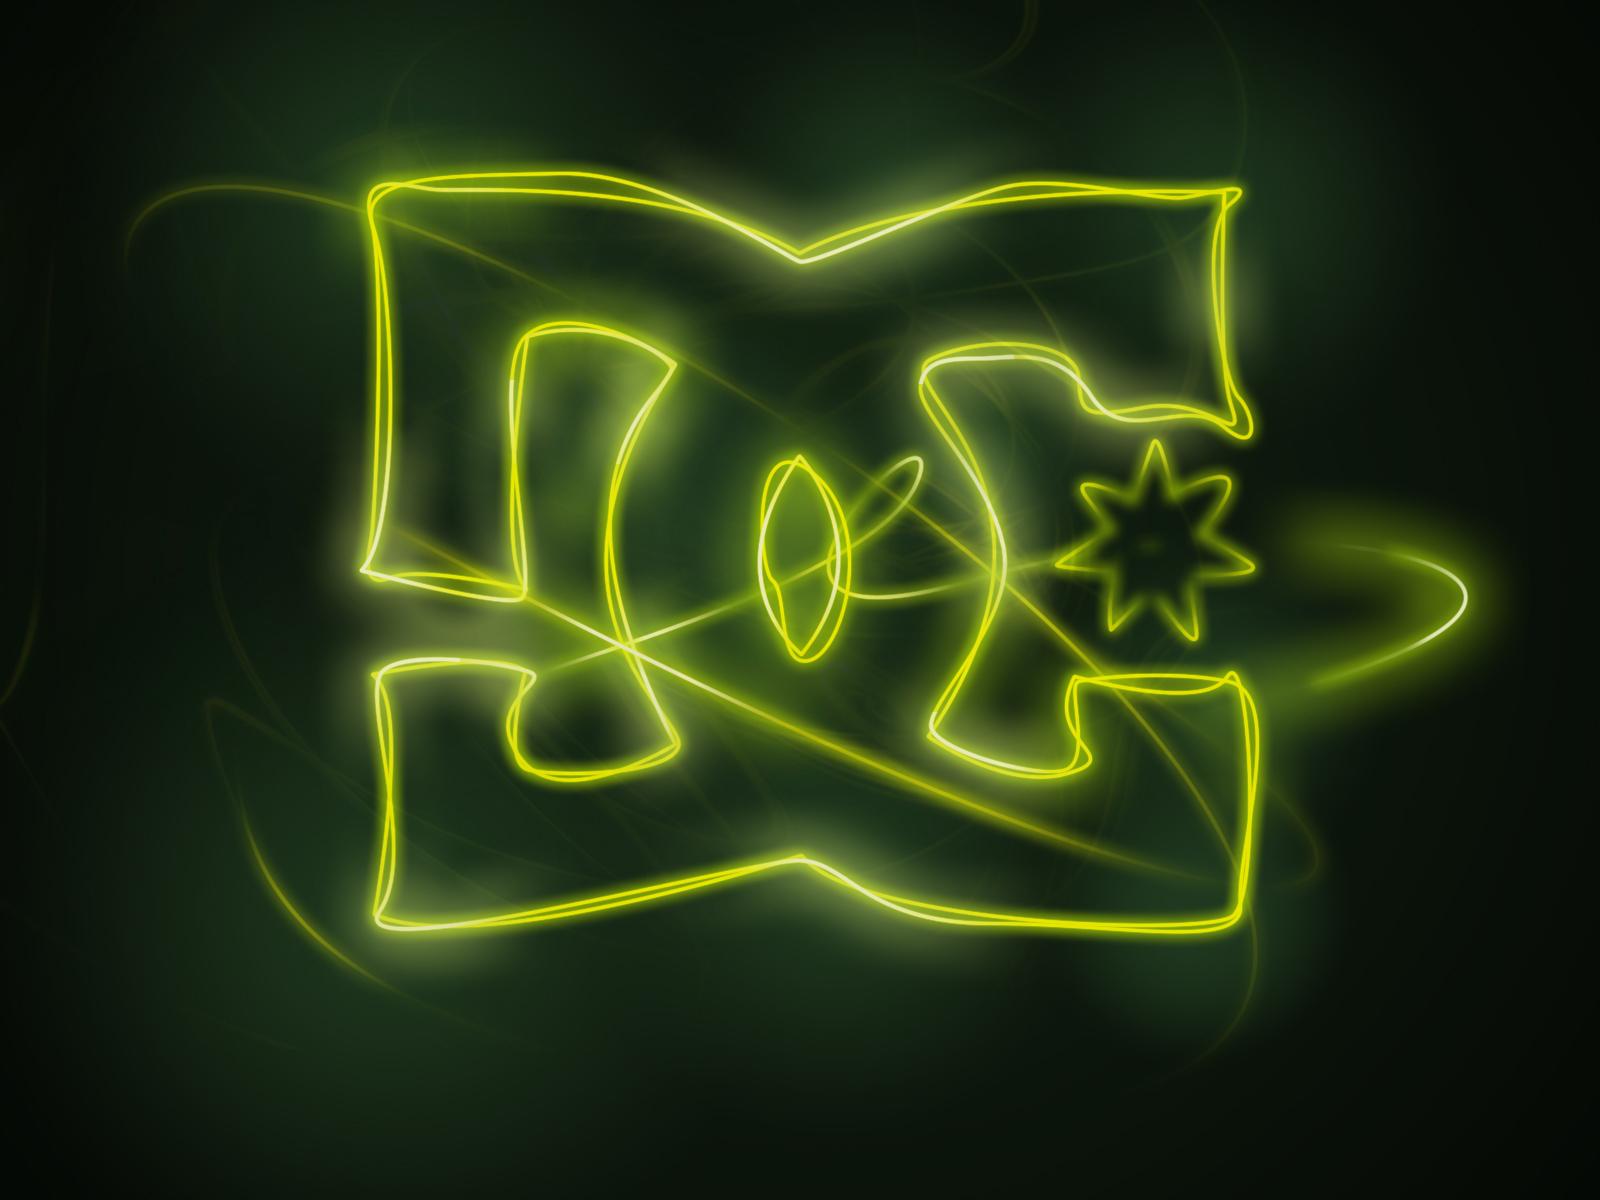 All Logos DC Logo 1600x1200